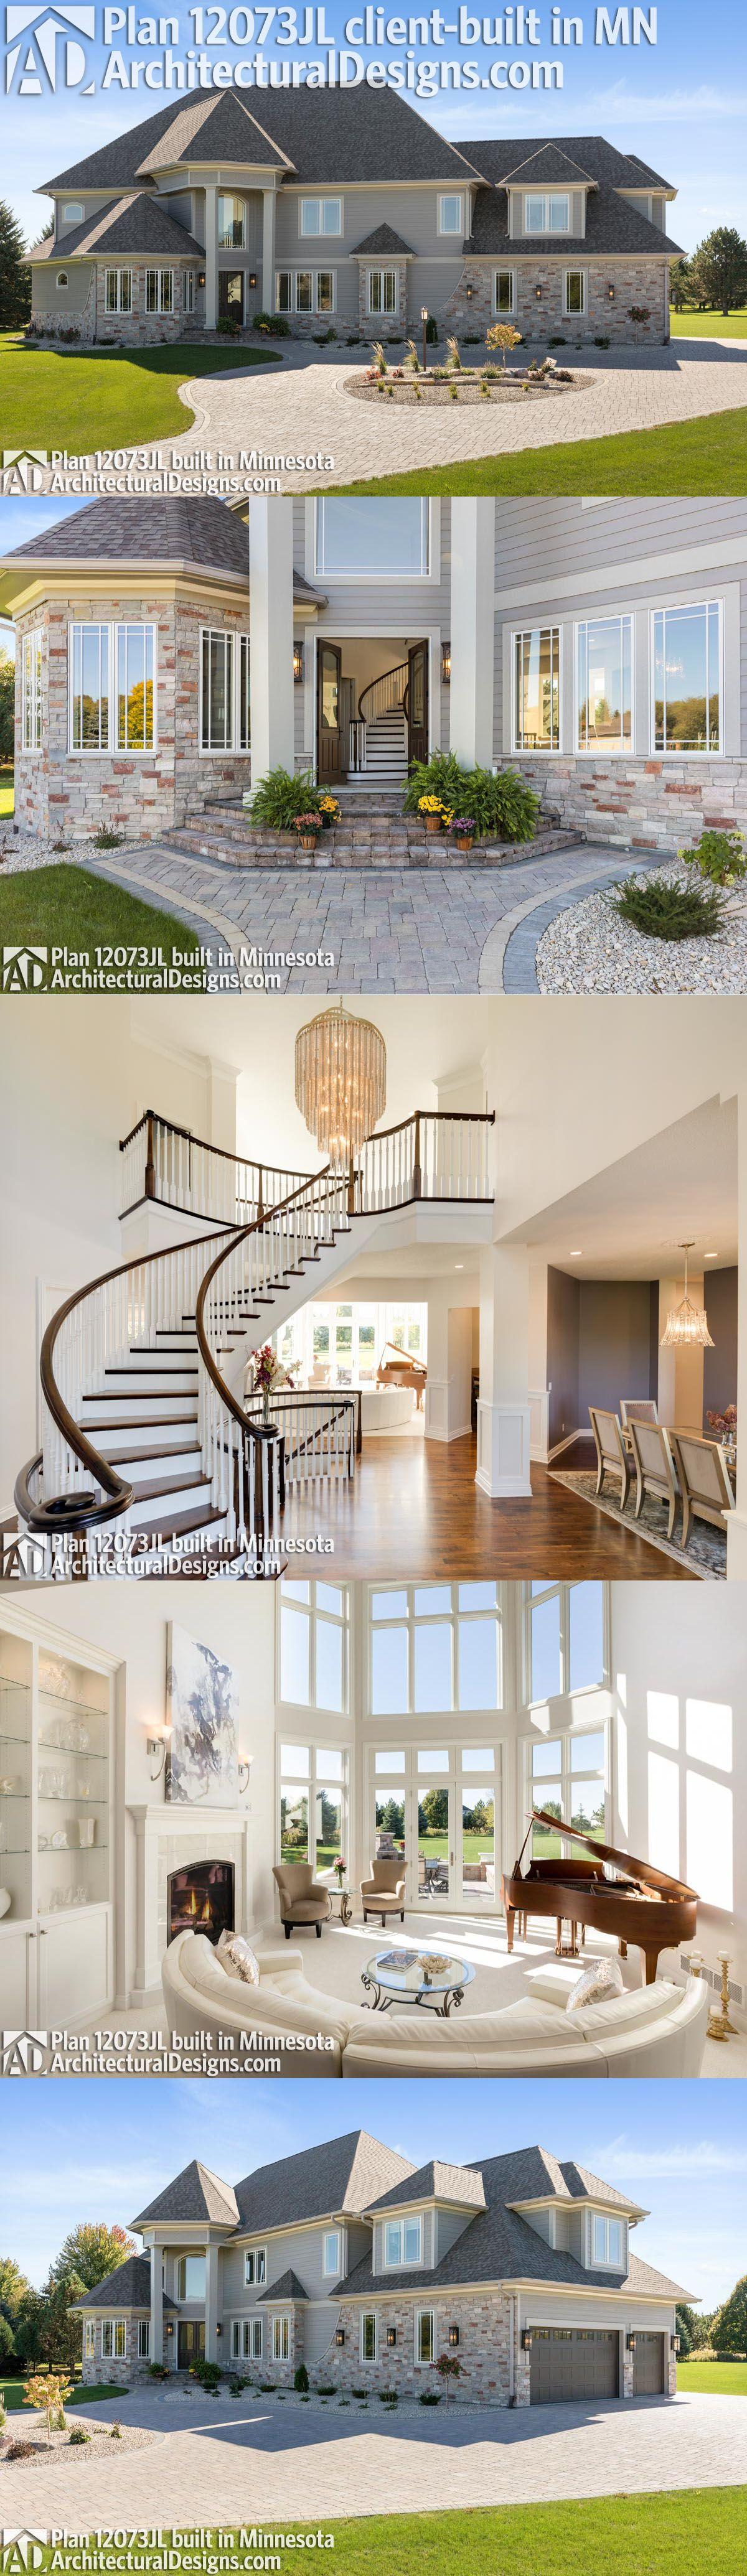 Plan 12073jl Luxury Home Plan With Elegant Interior Architectural Design House Plans Luxury House Plans House Design